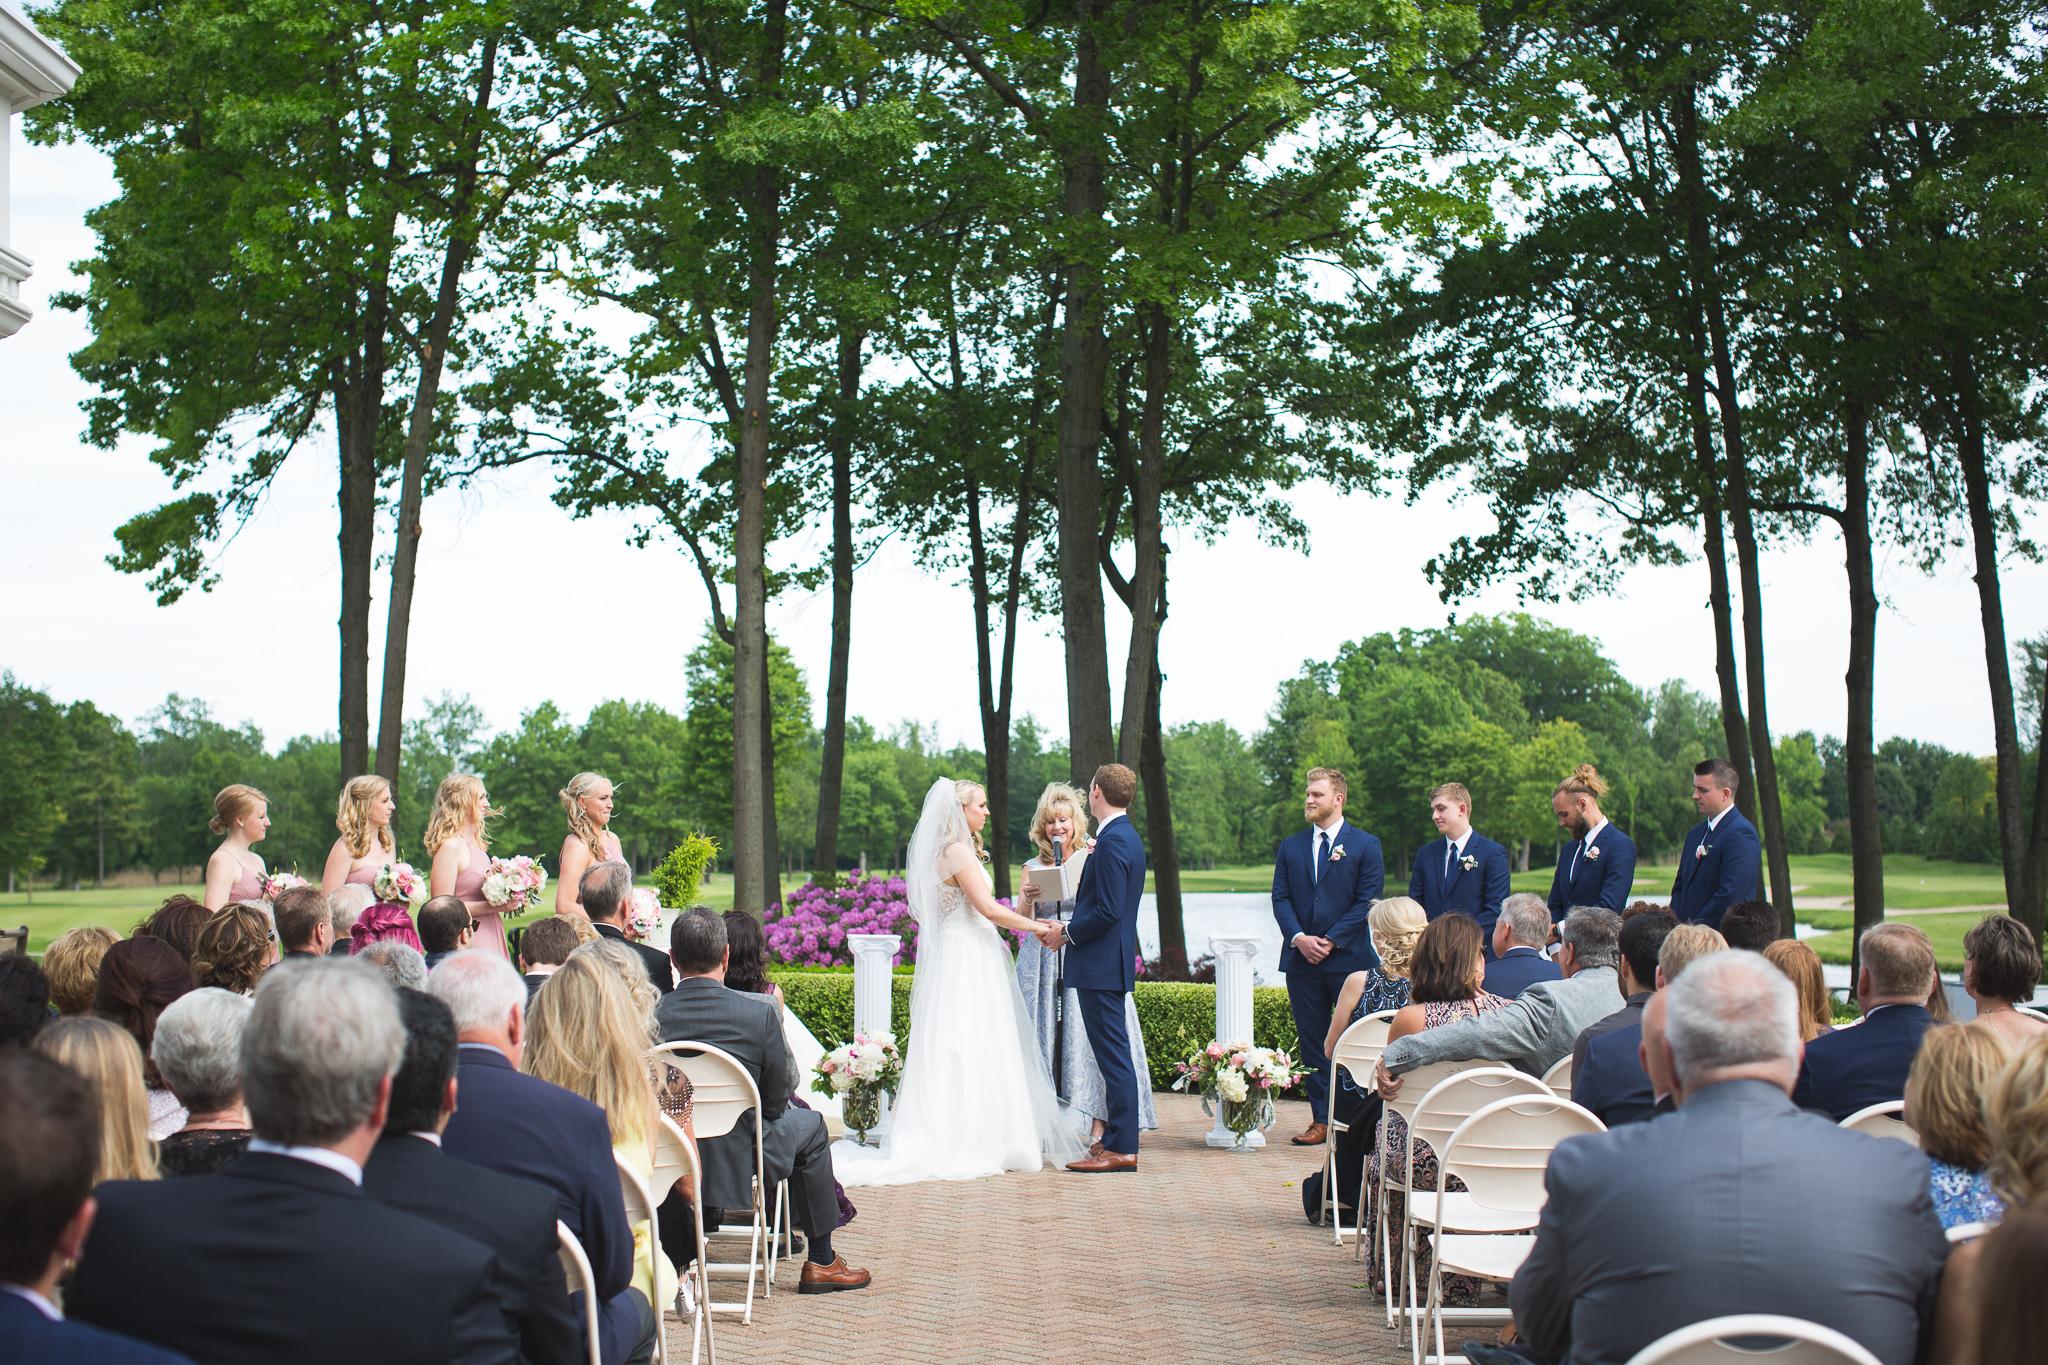 087-best-detroit-michigan-outdoor-wedding-photographer.jpg